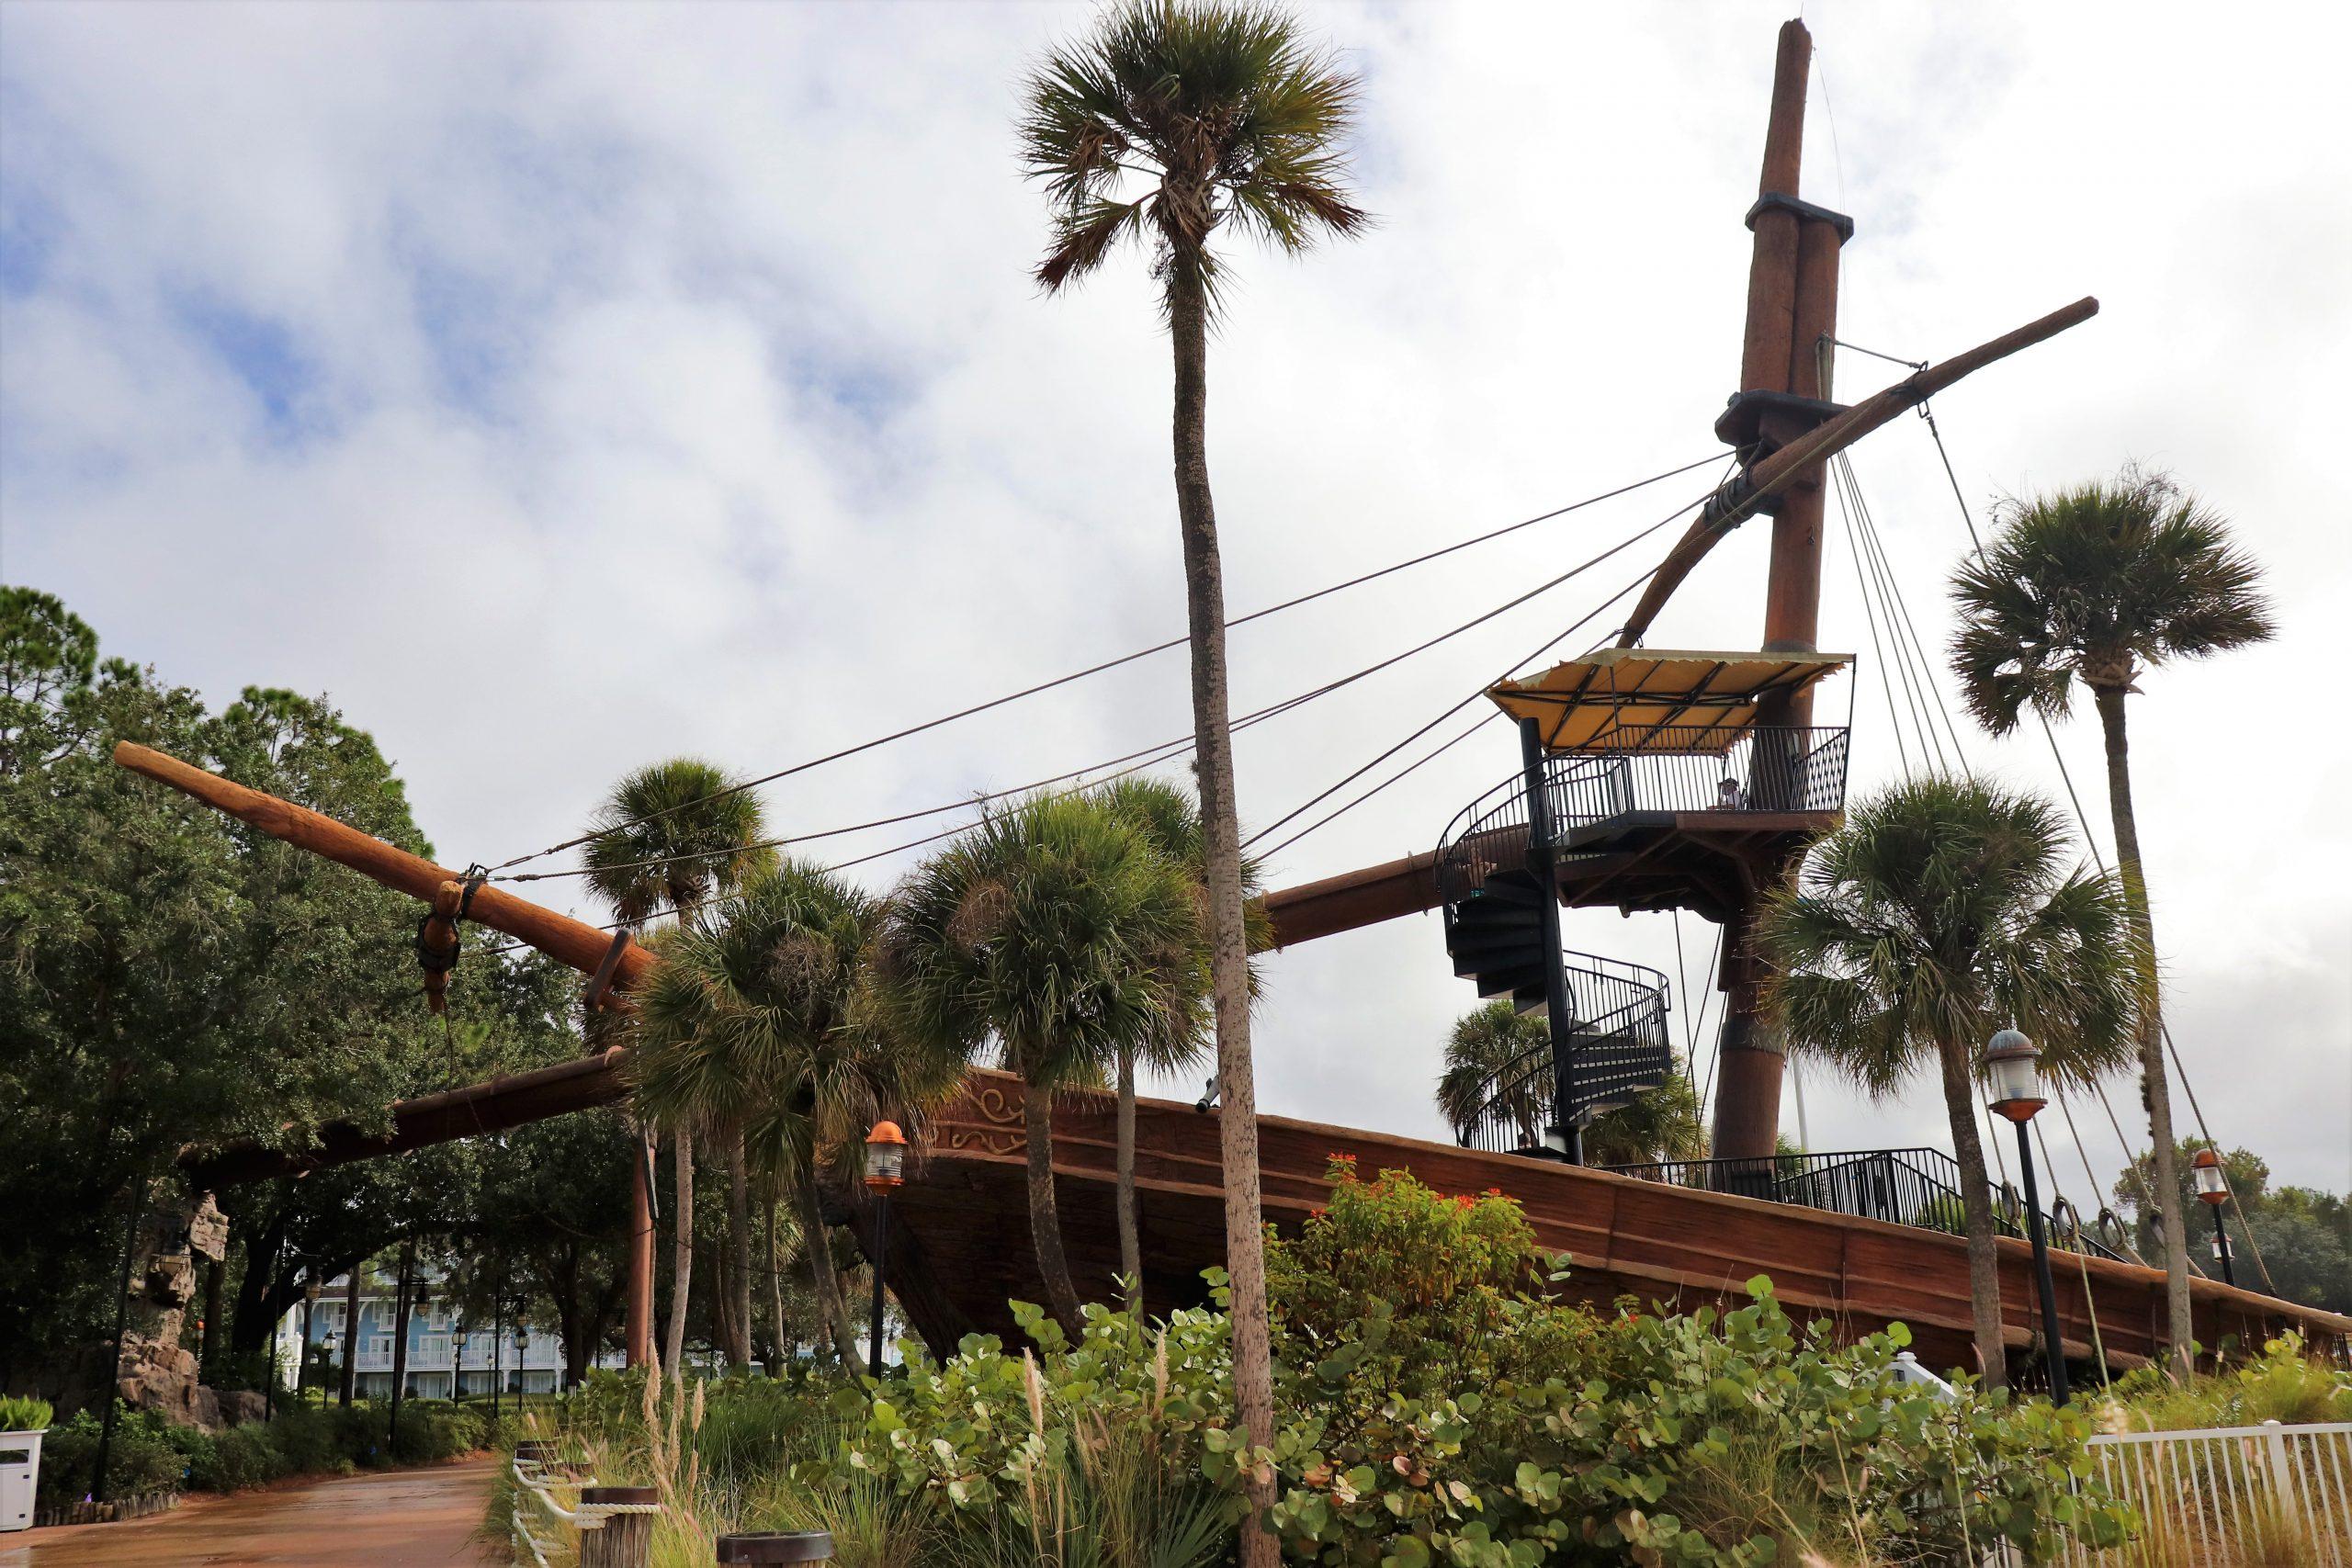 Disney's Yacht Club - Stormalong Bay